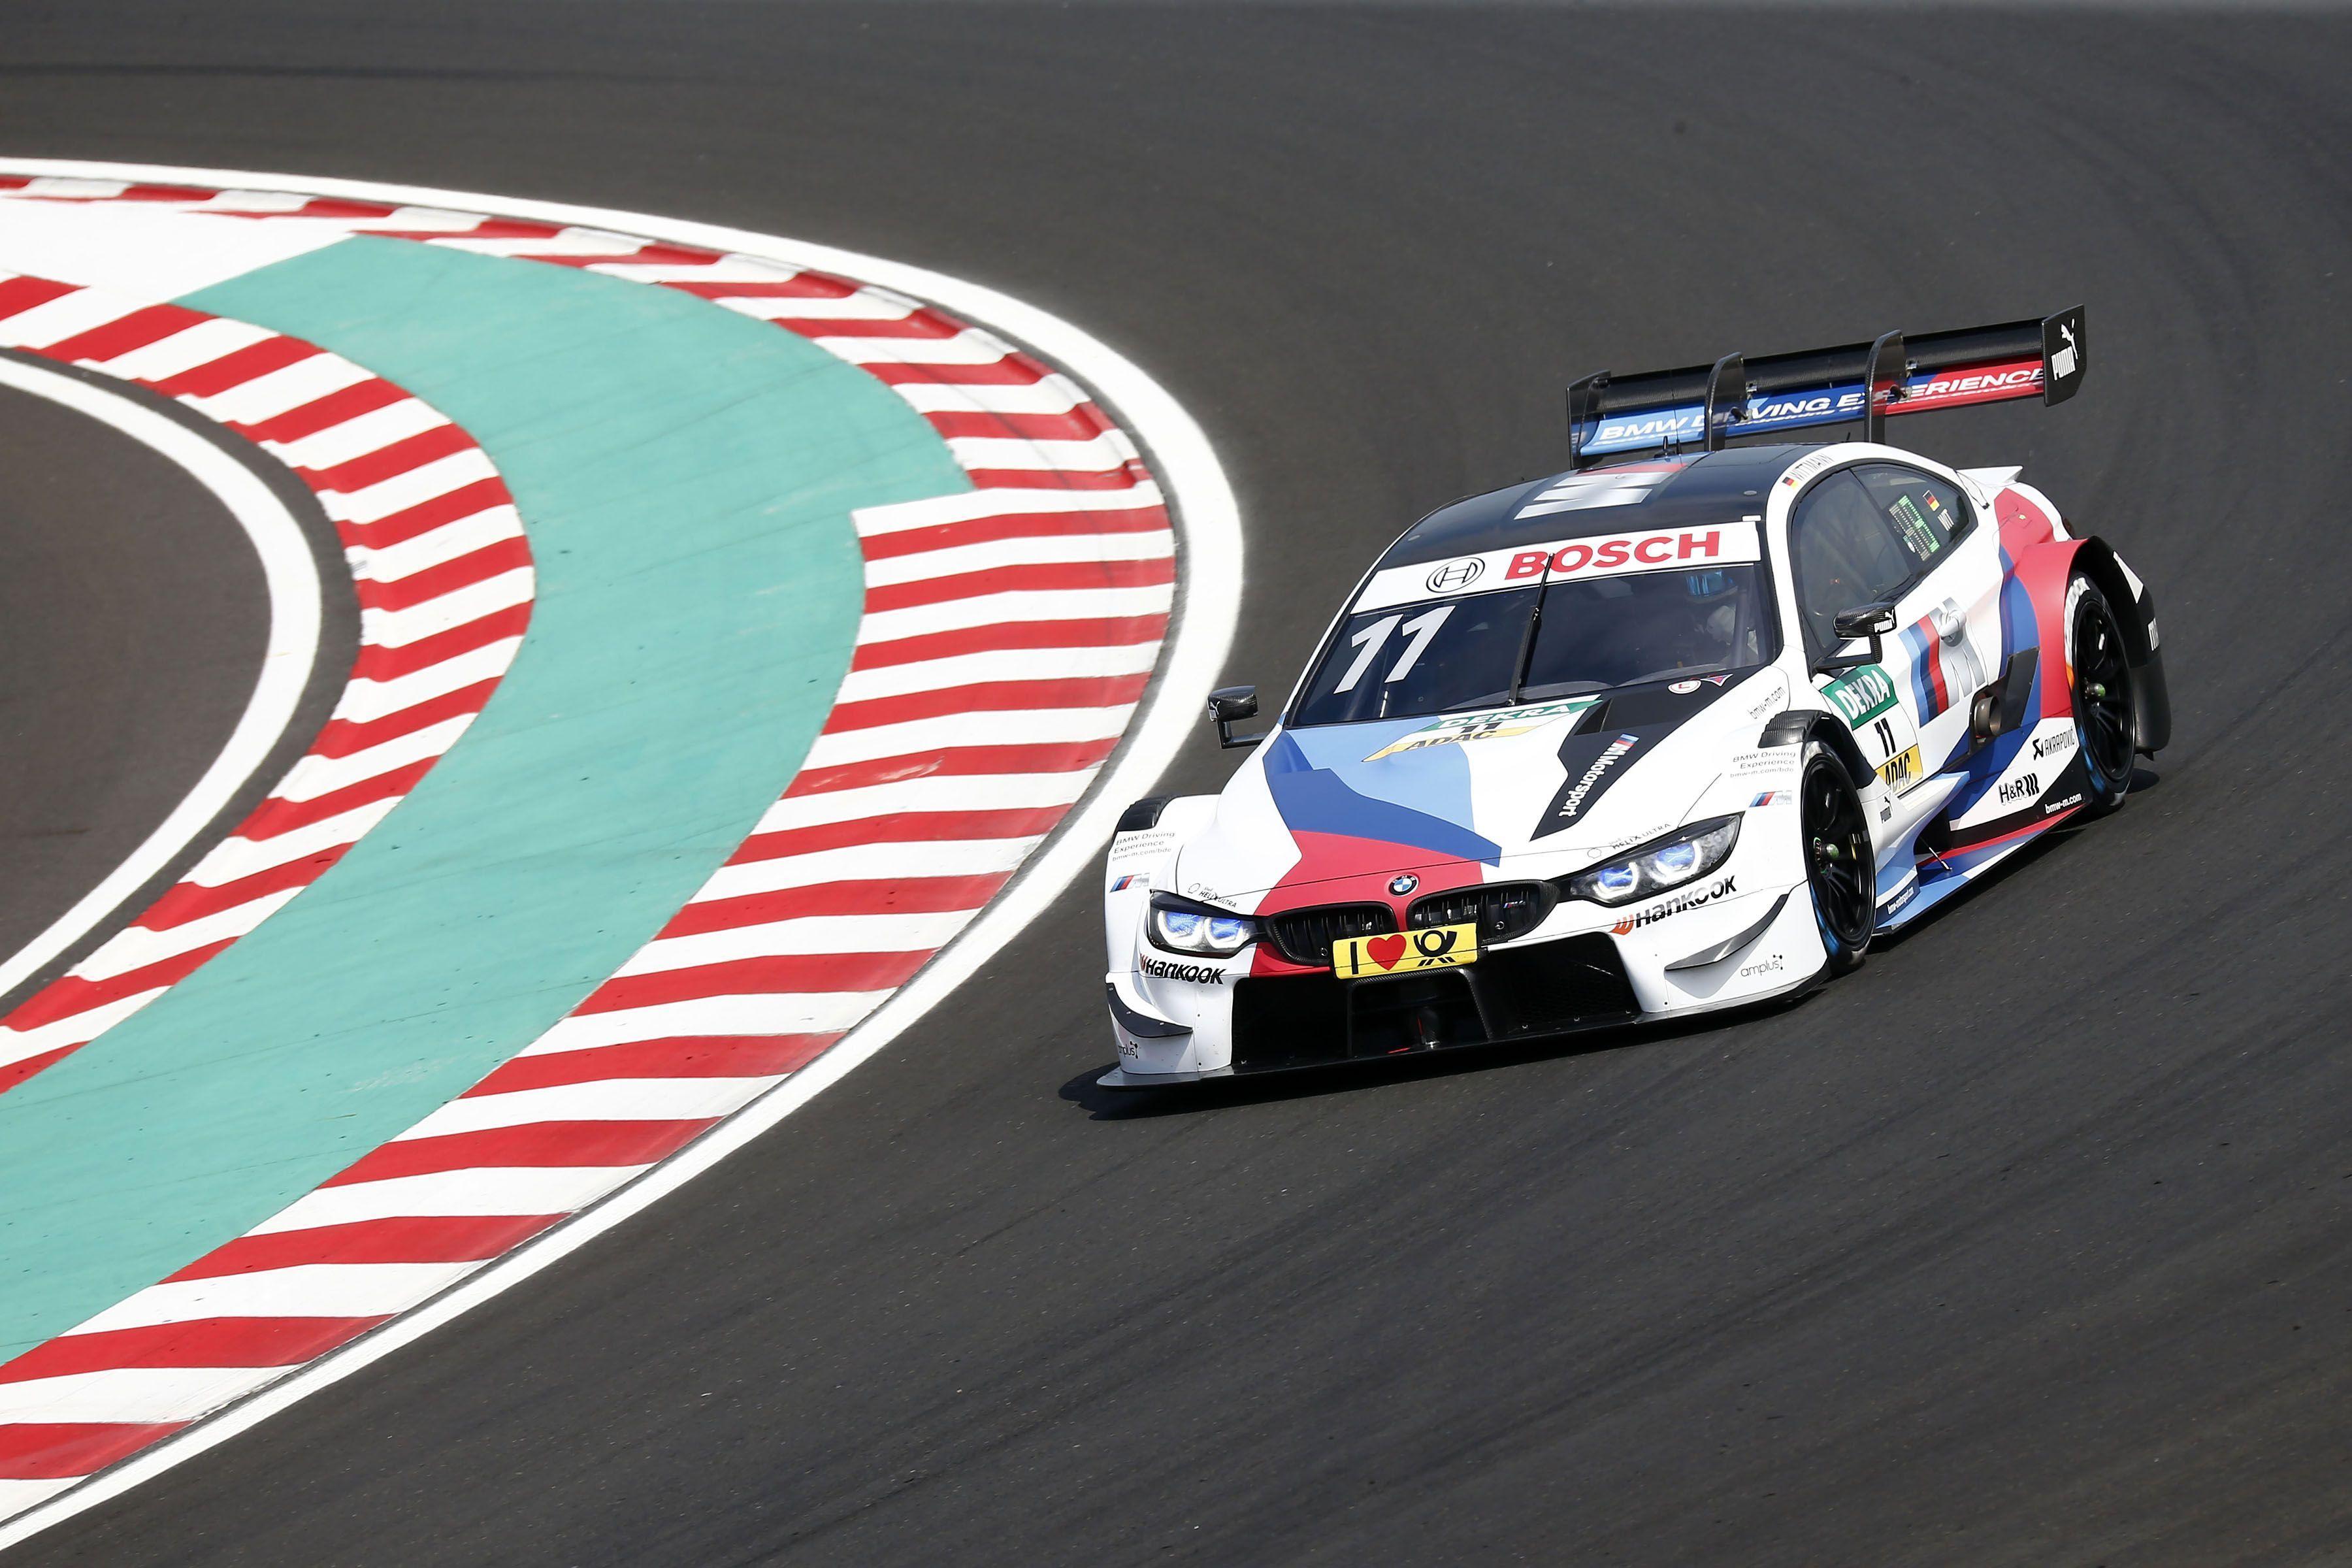 Marco Wittman gana bajo la lluvia del Hungaroring con triplete de BMW